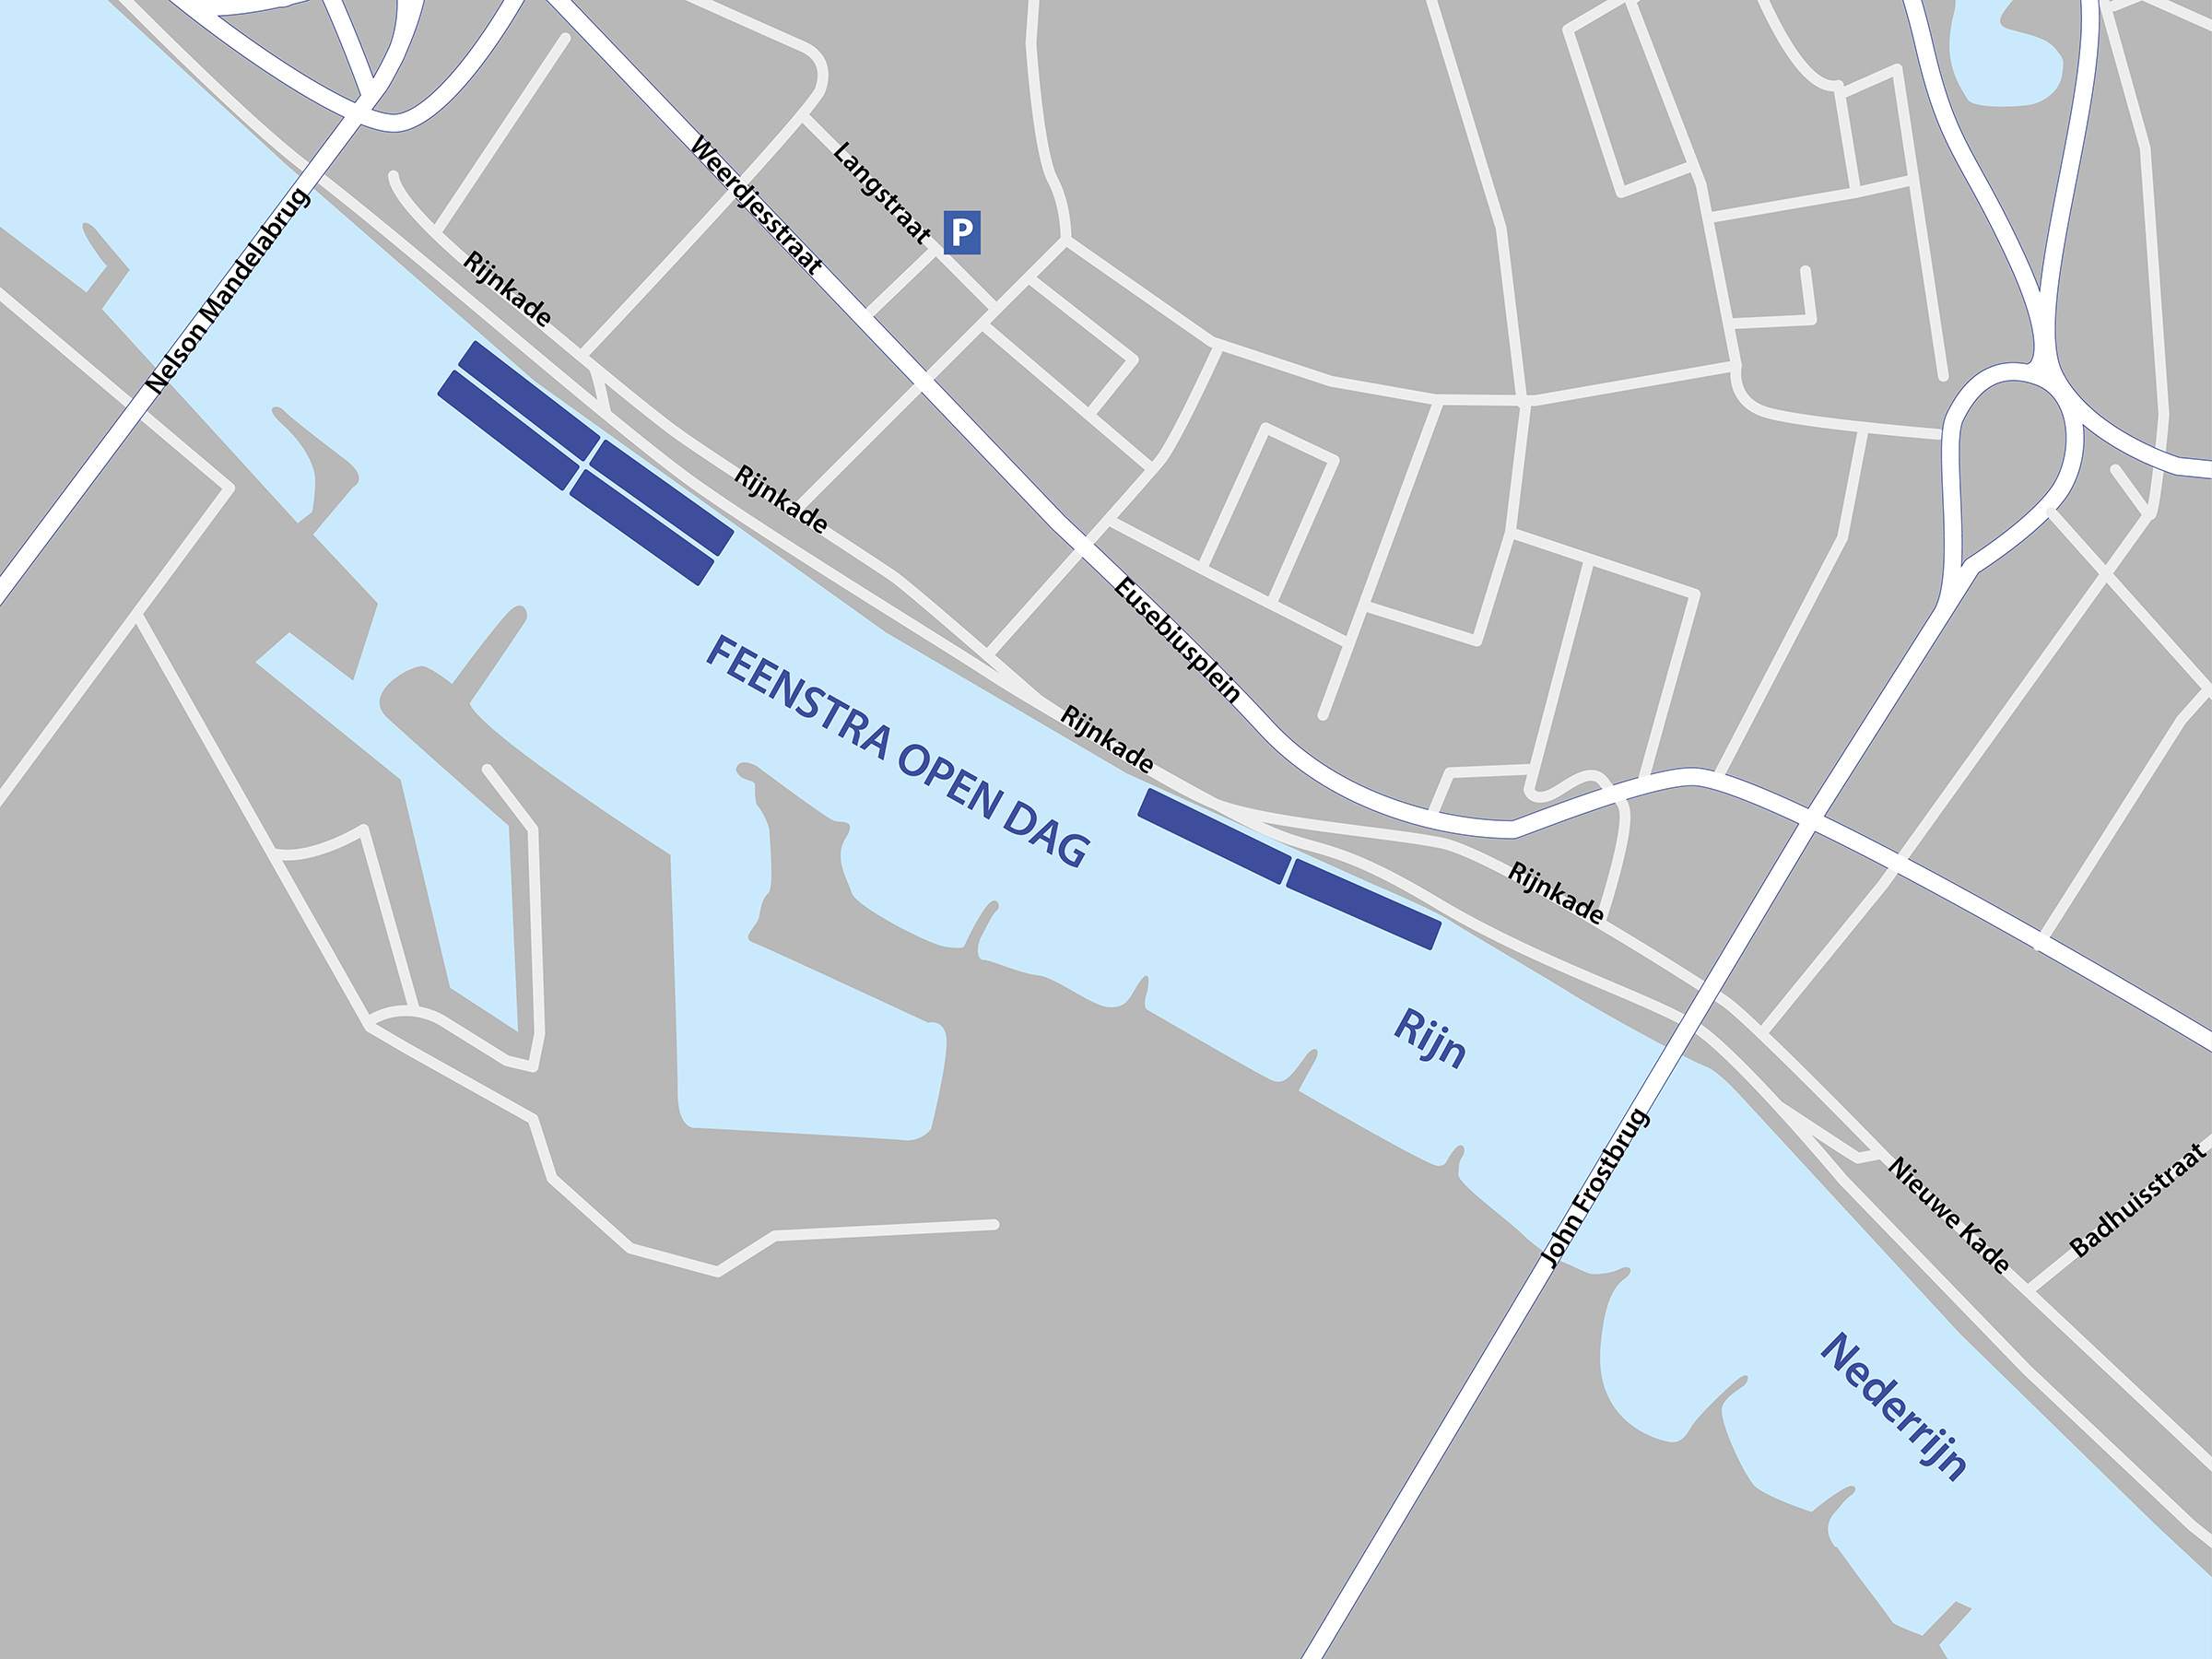 Open-dagen-plattegrond-2019-Arnhem.jpg#asset:125550991